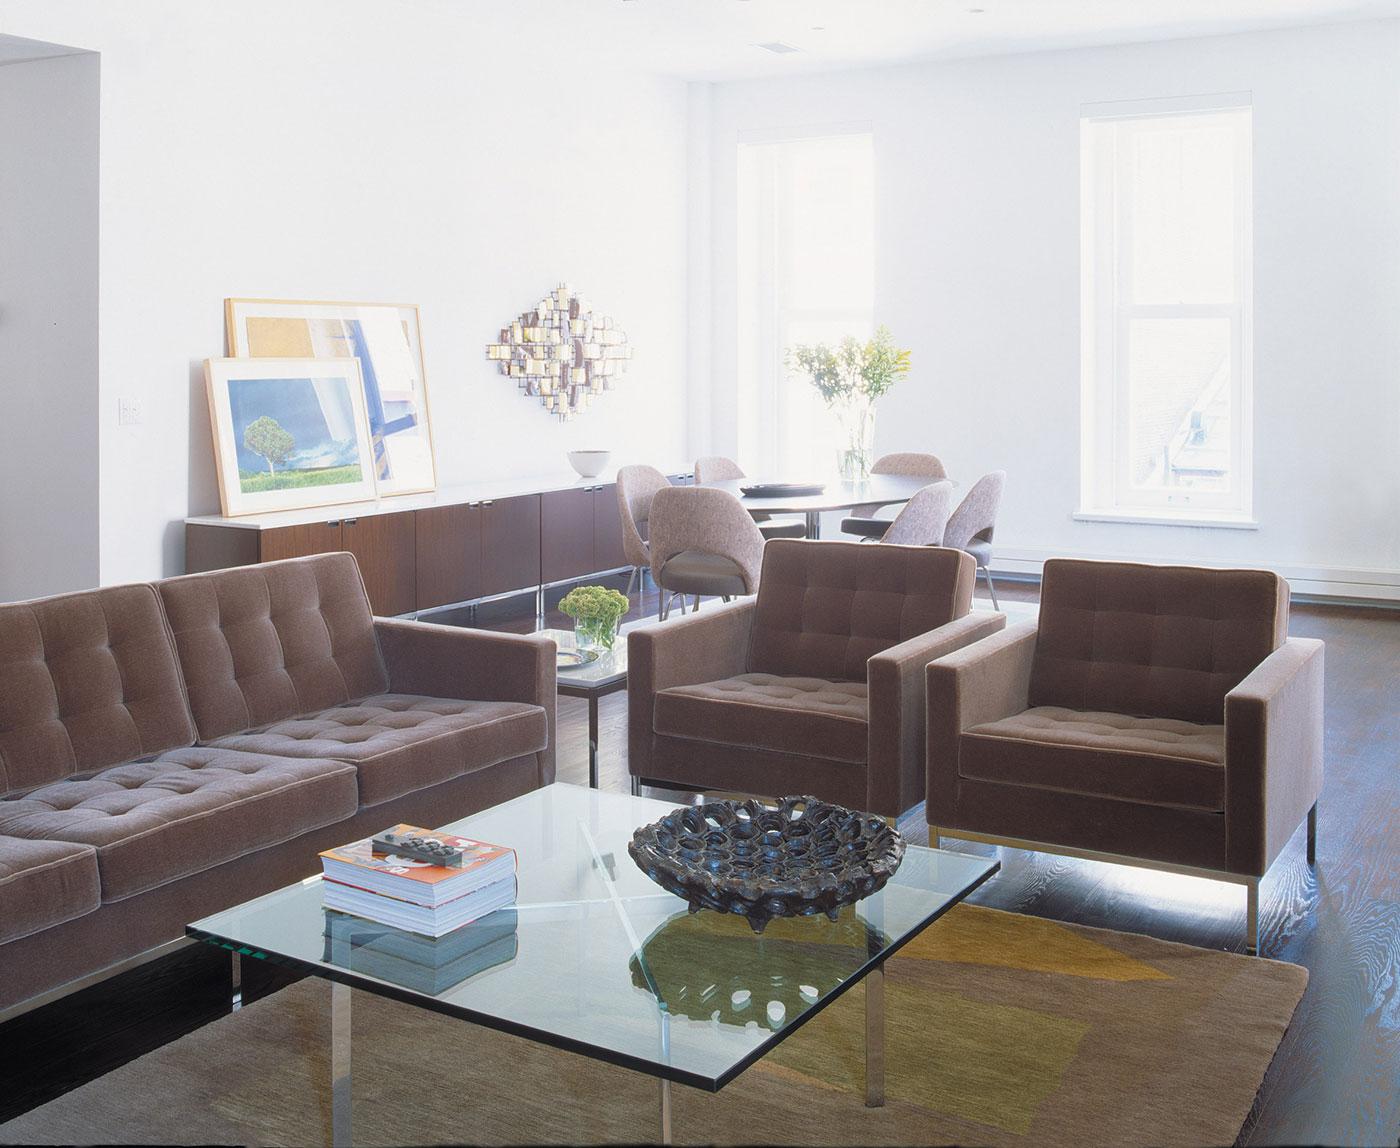 Obegi Home Furniture Knoll Chairs And Sofa